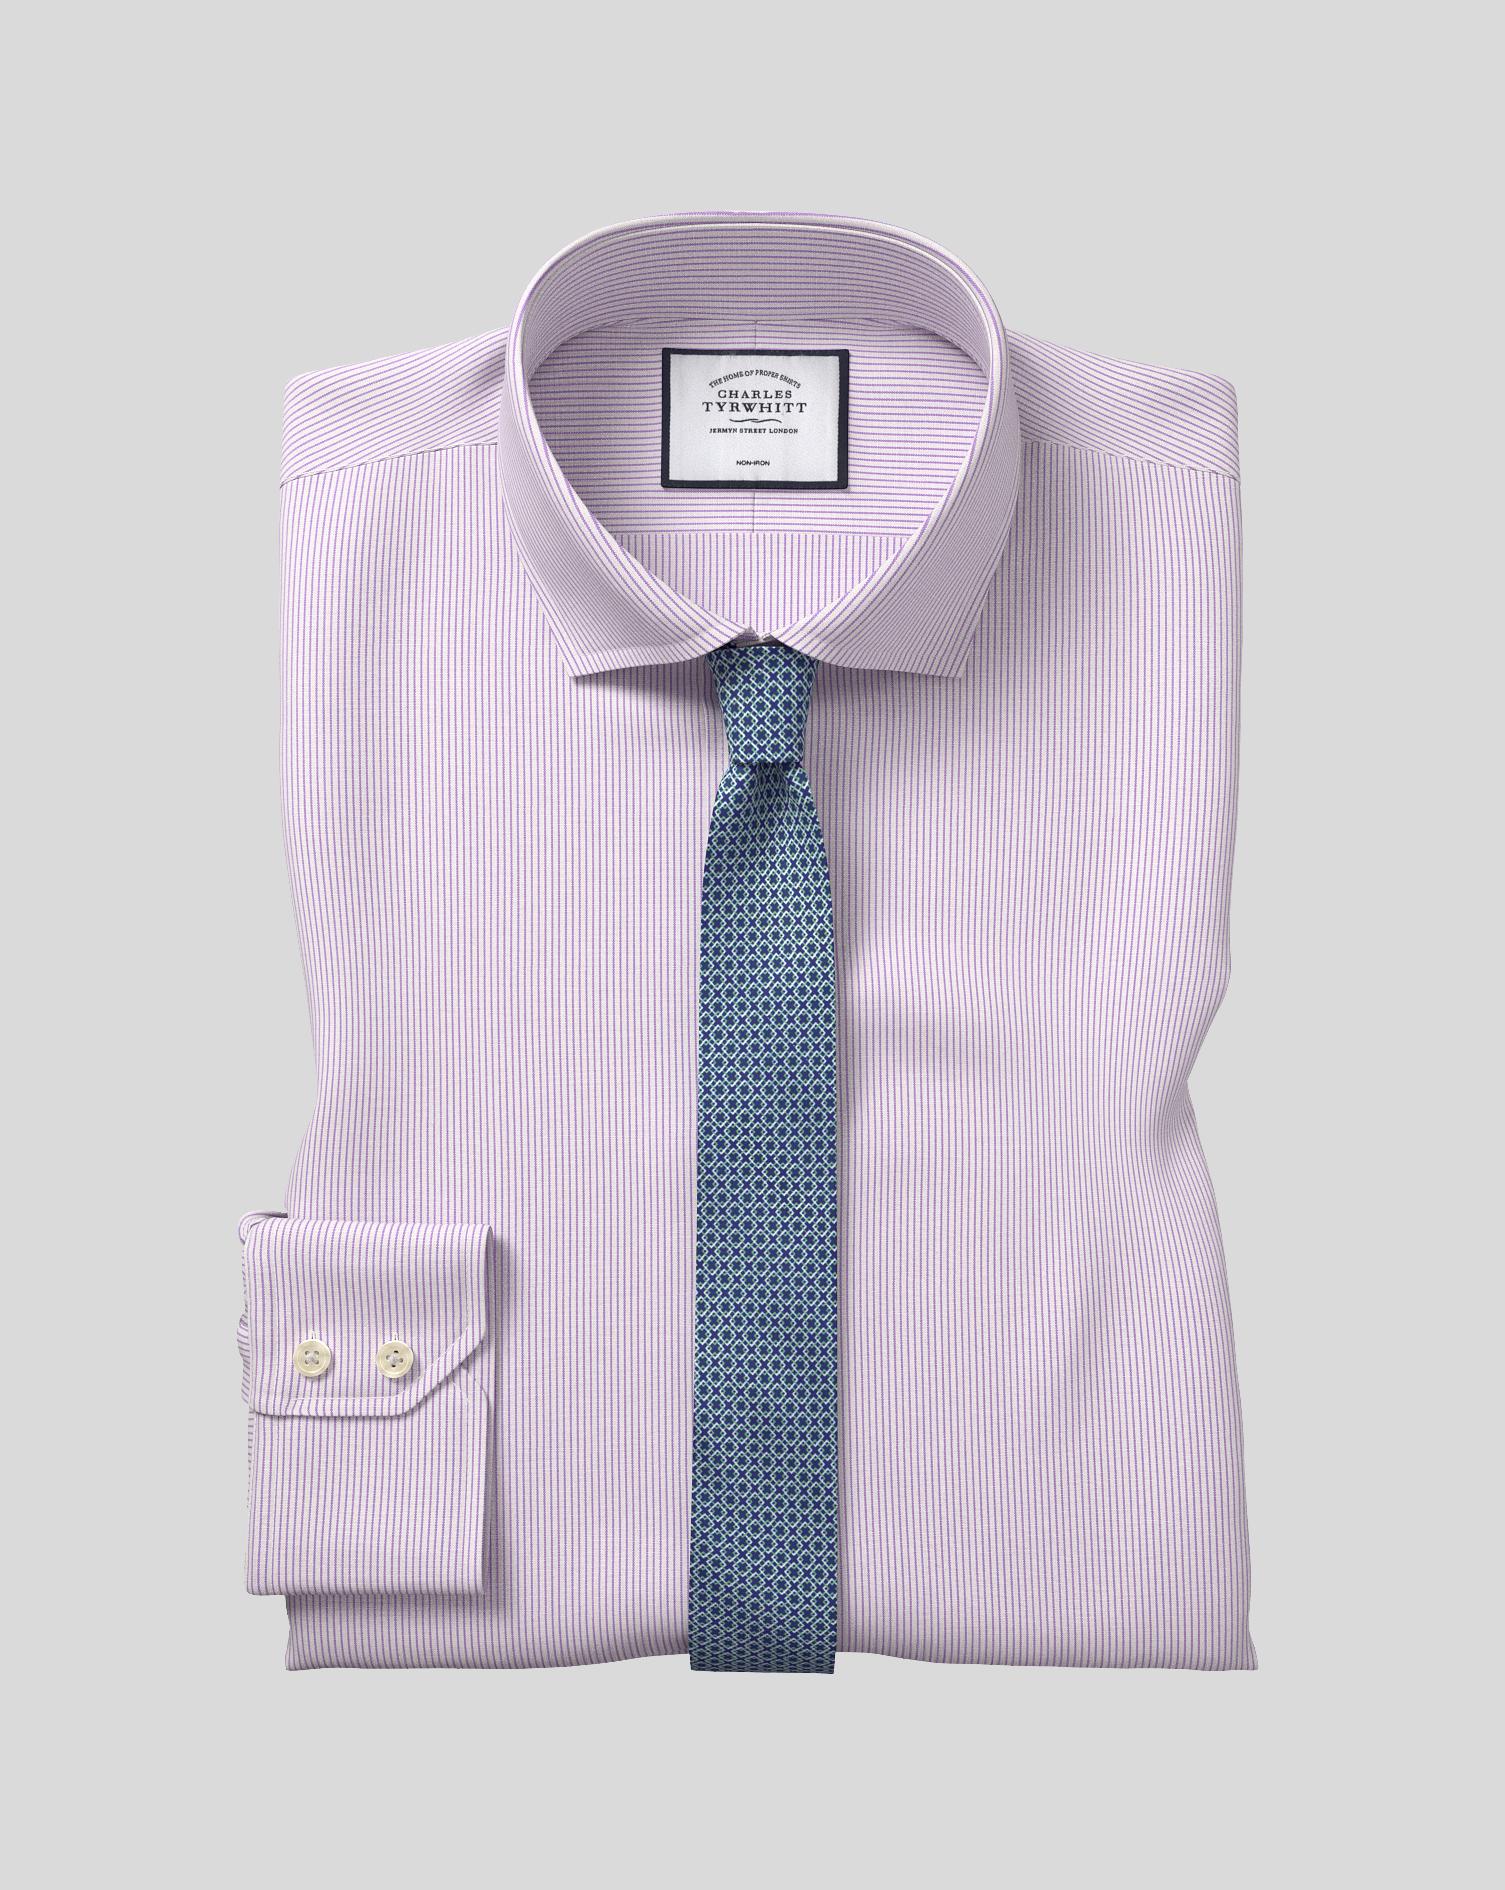 Cotton Cutaway Collar Non-Iron 4 Way Stretch Stripe Shirt- Lilac